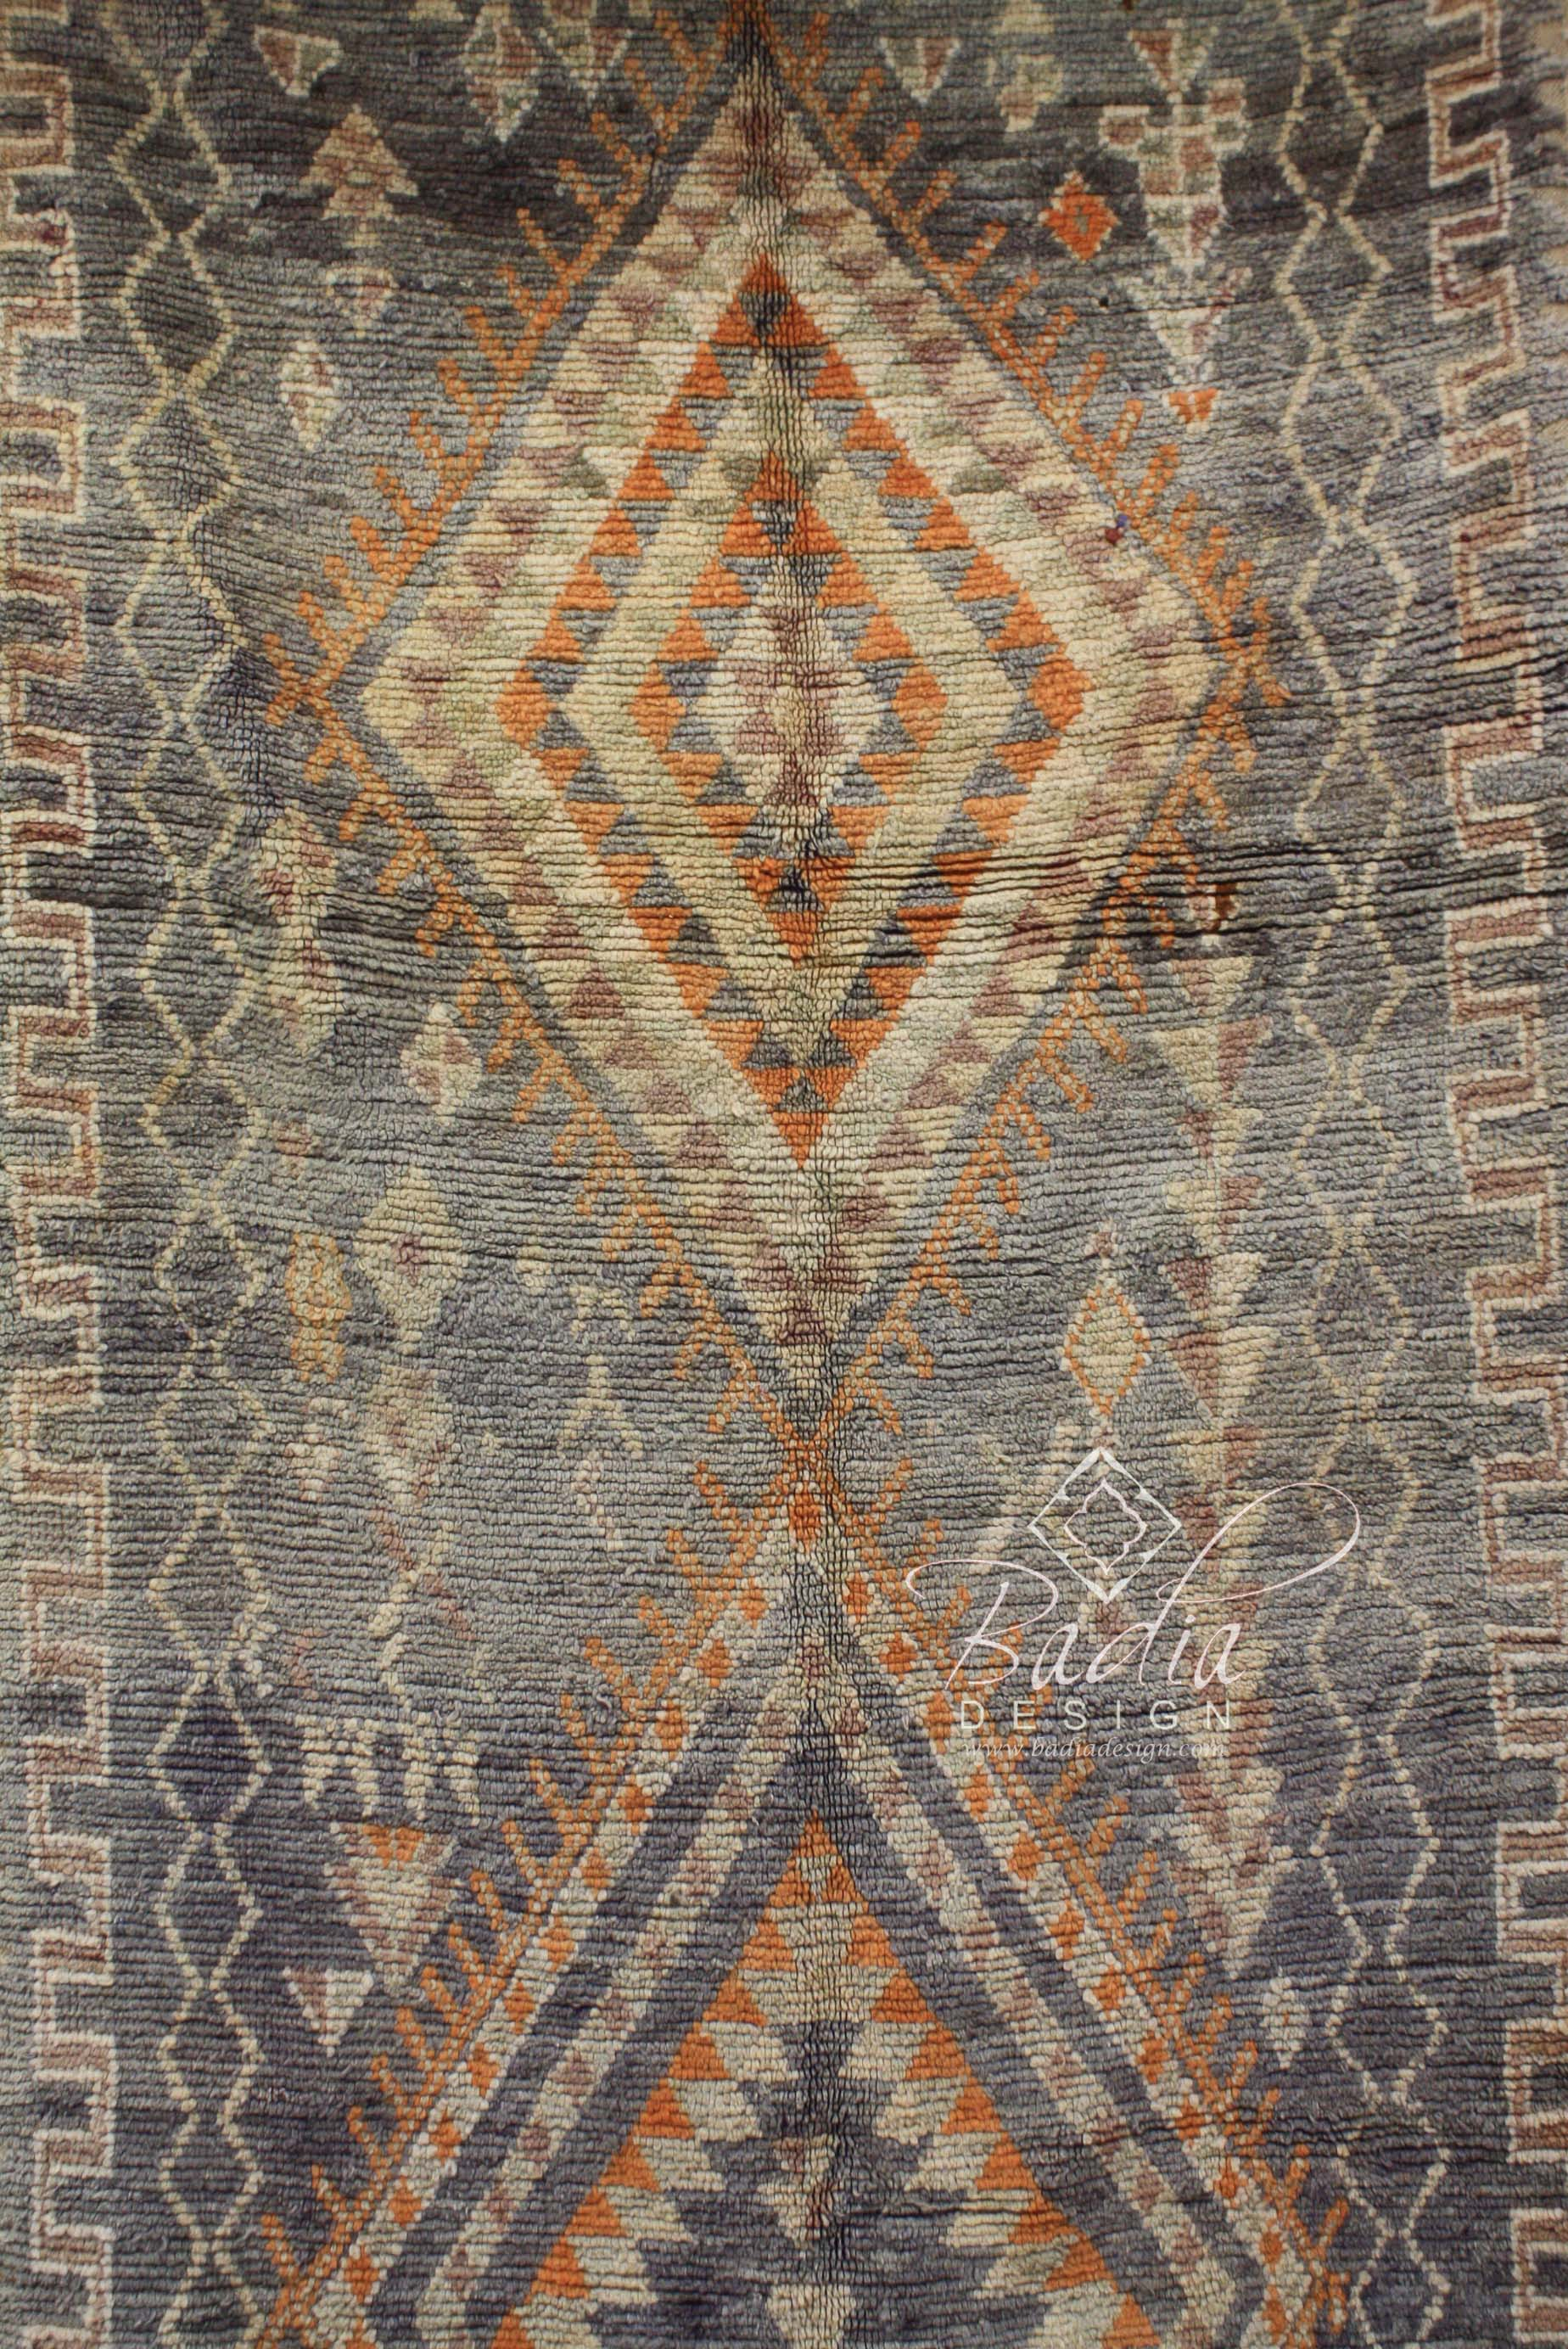 moroccan-vintage-rug-store-los-angeles-r773-2.jpg